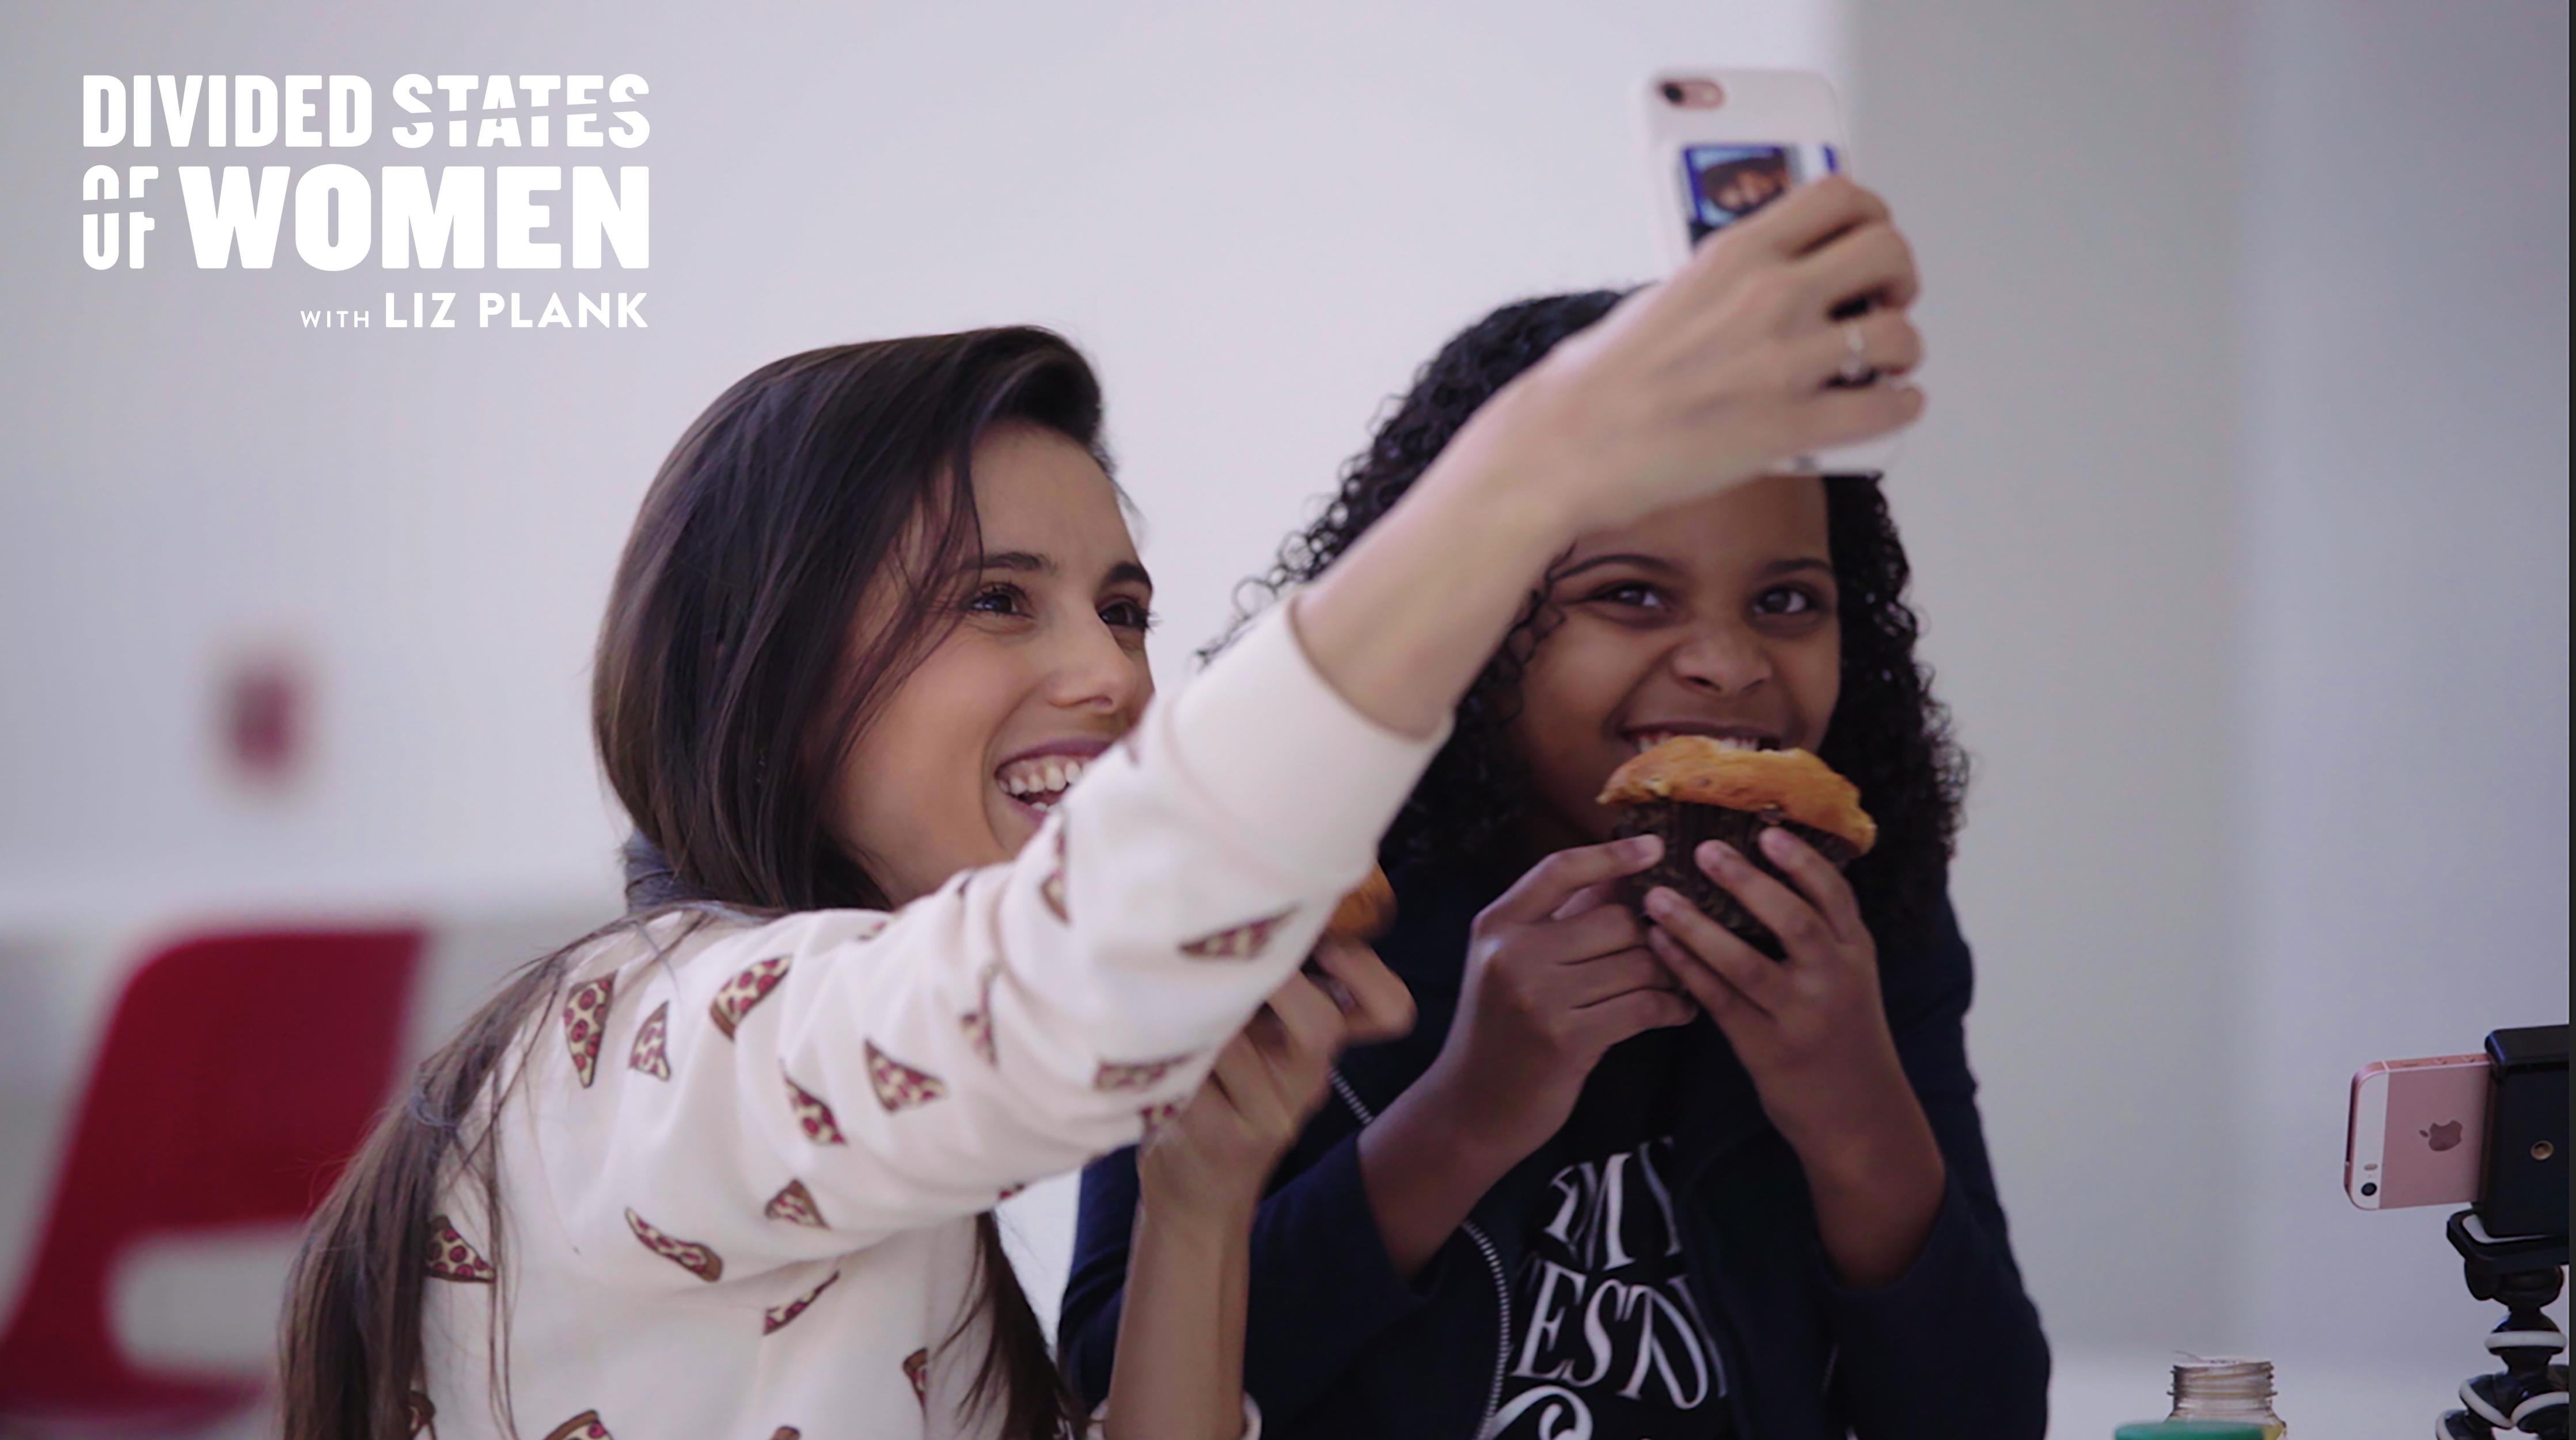 Mari Copeny (Little Miss Flint) and Liz Plank take a selfie together